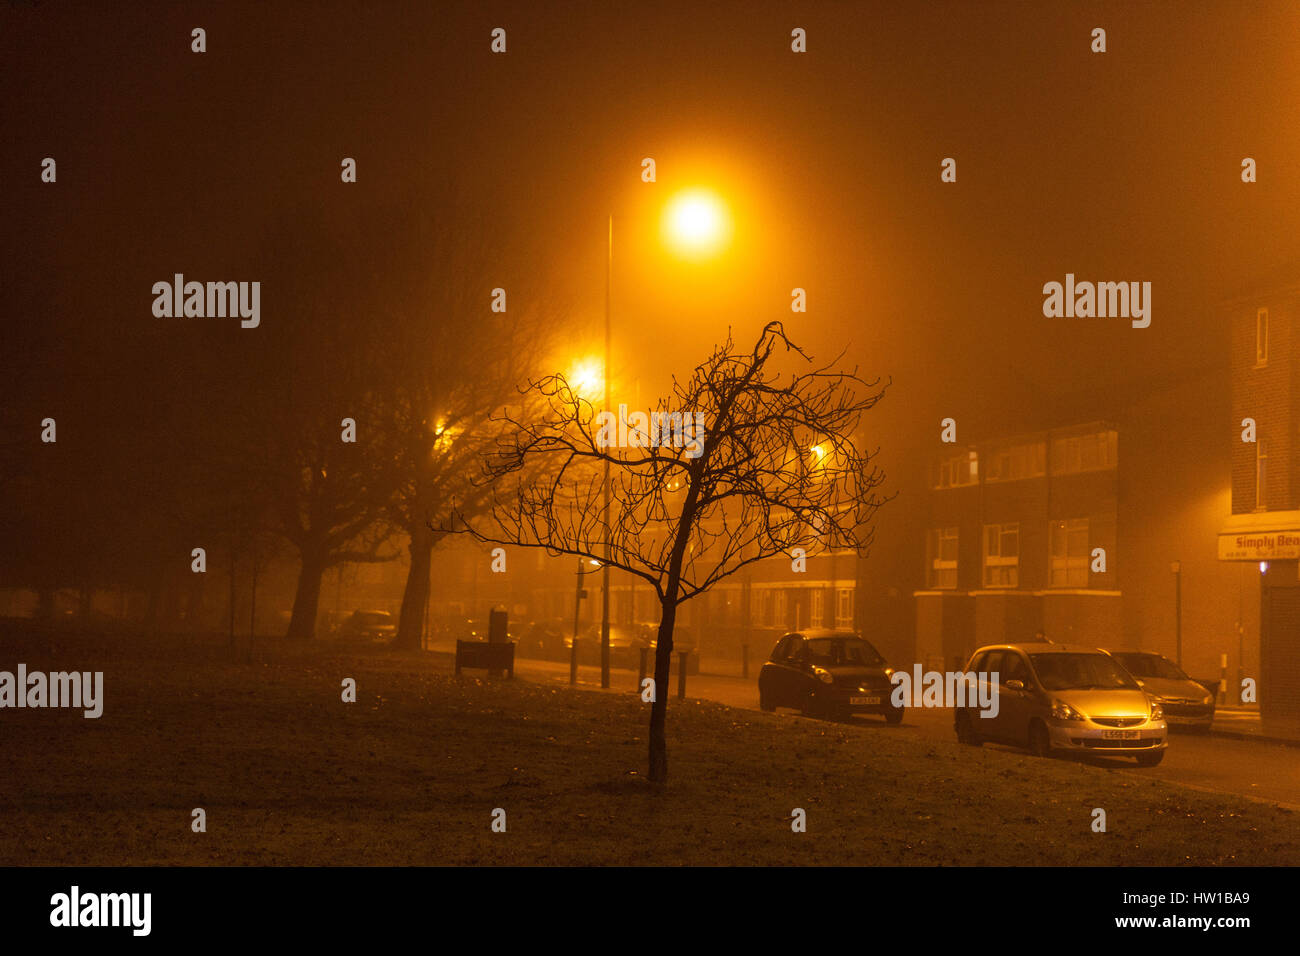 Amber Yellow Glow From Sodium Vapor Street Lights In Misty Night Queensbury Harrow